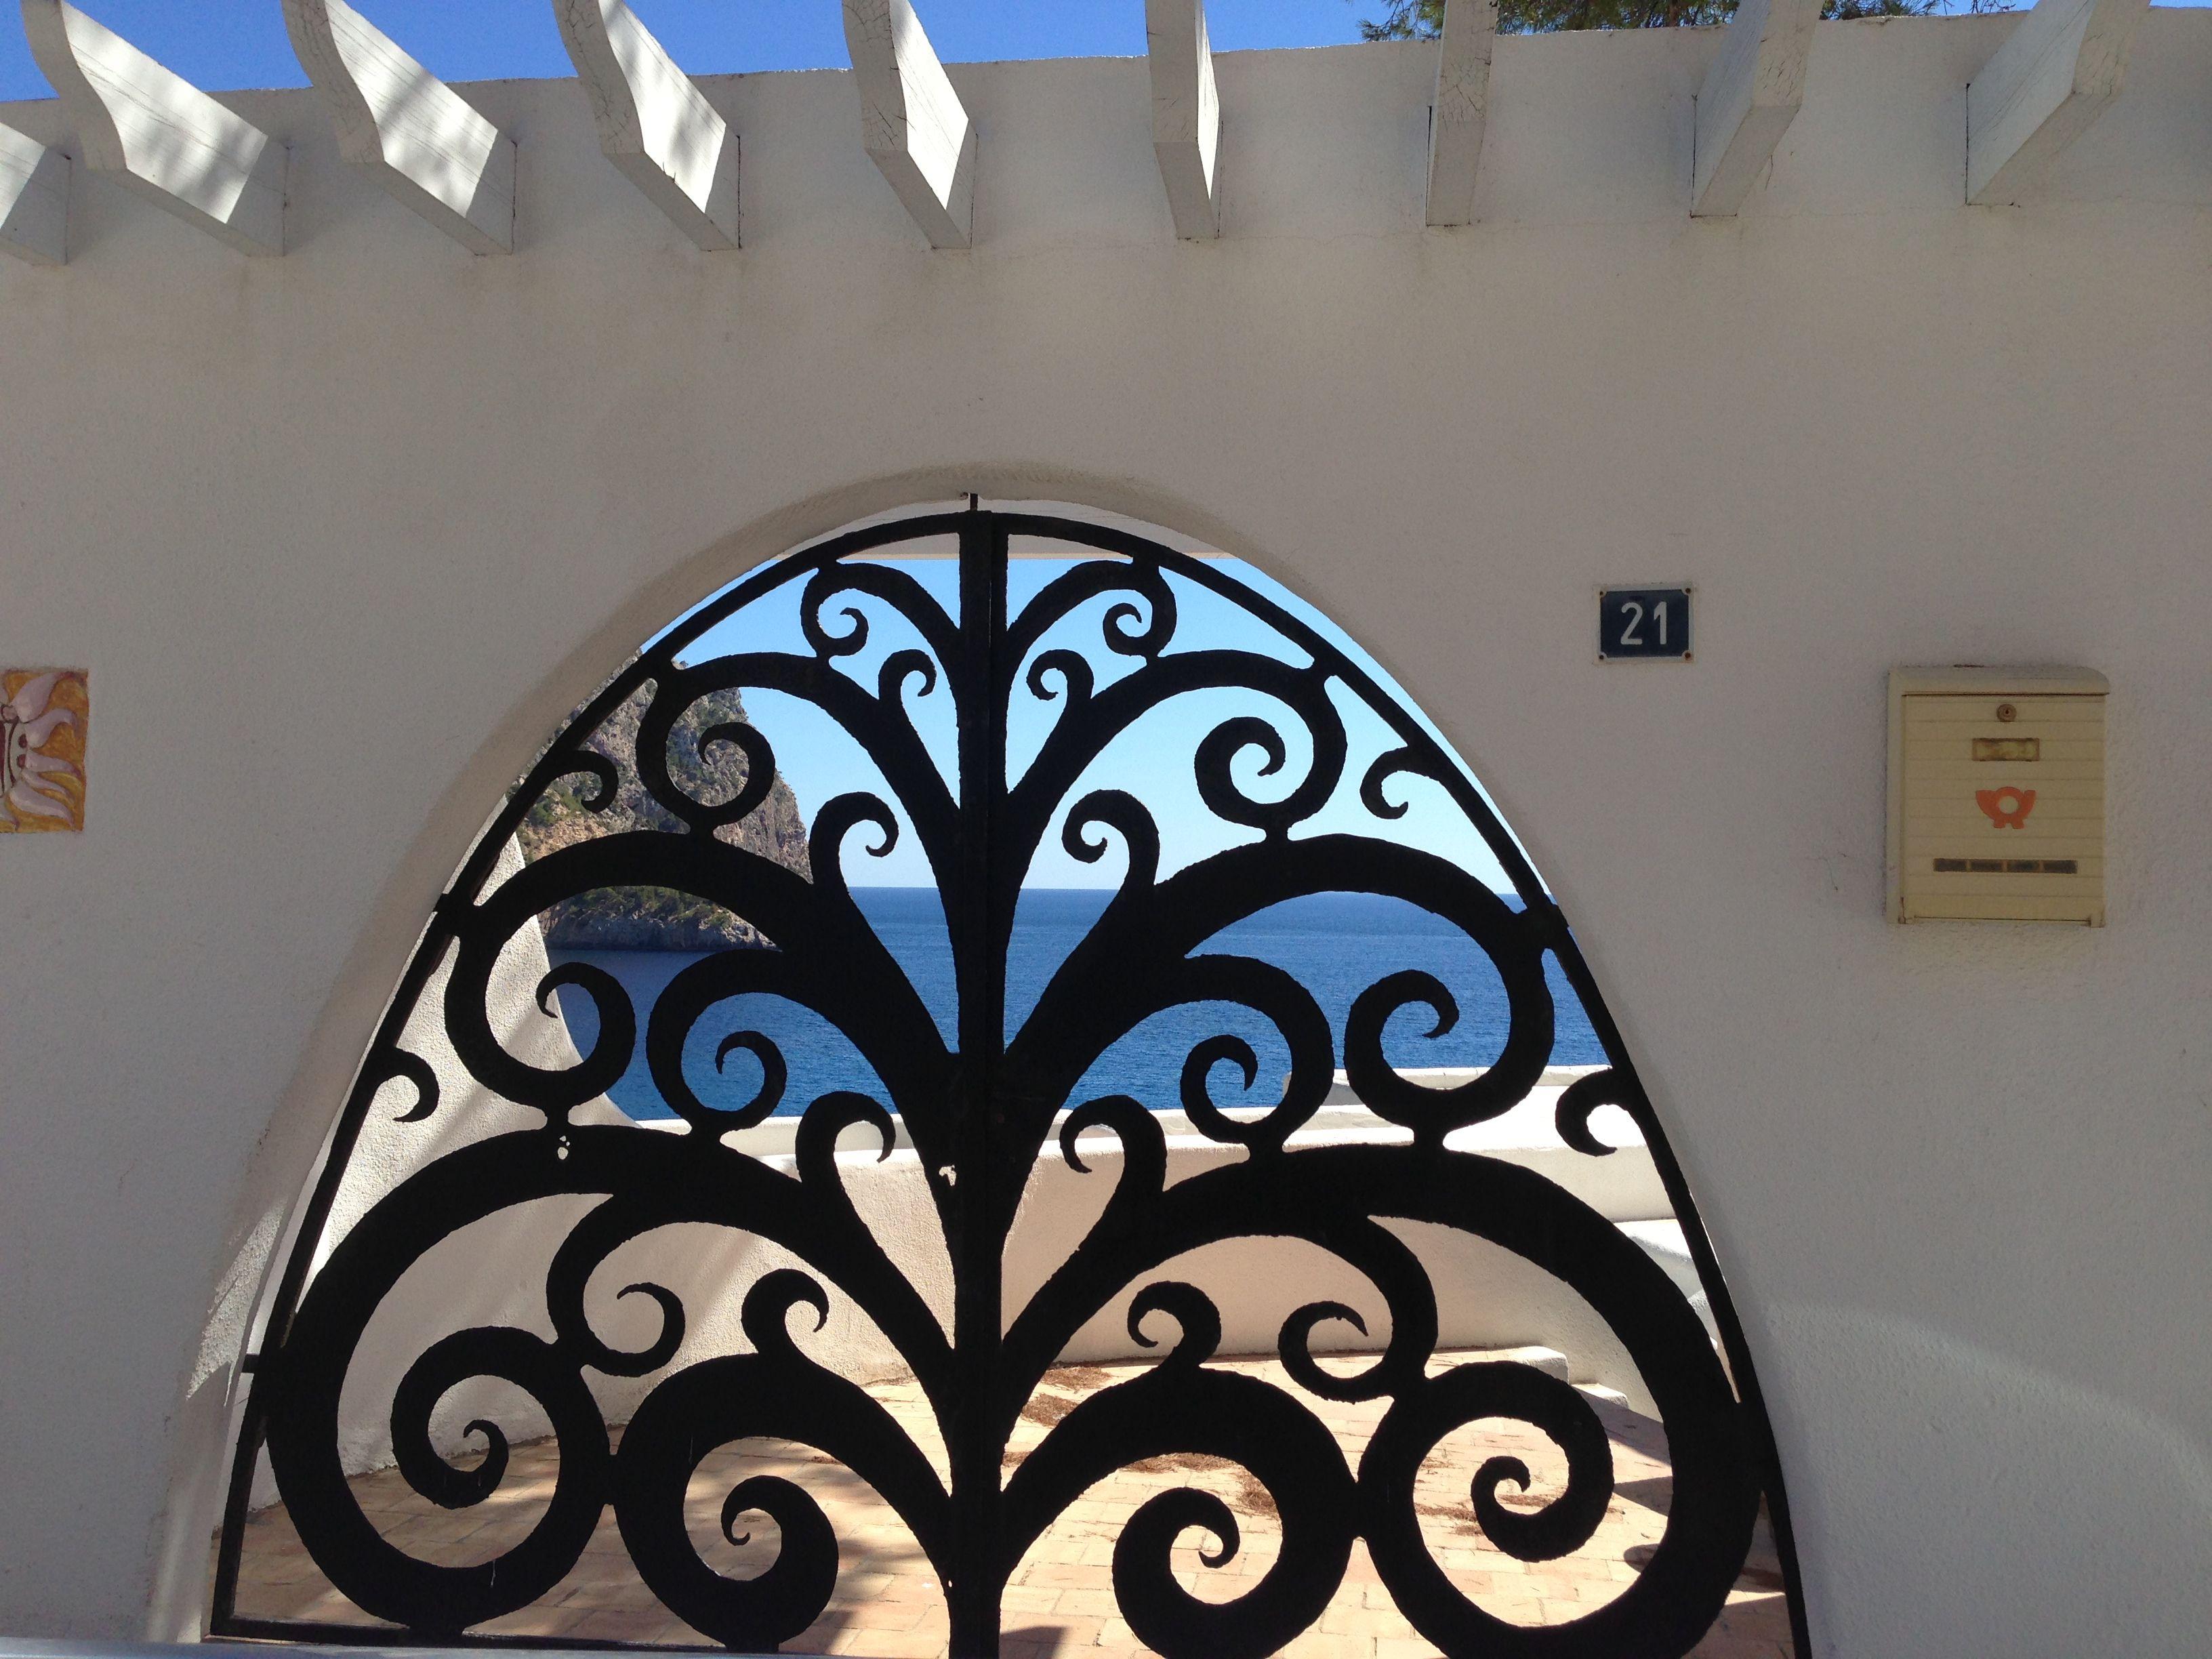 Einfaches wohnmöbel design door design  cala llamp mallorc diseño de puerta en hierro forjado